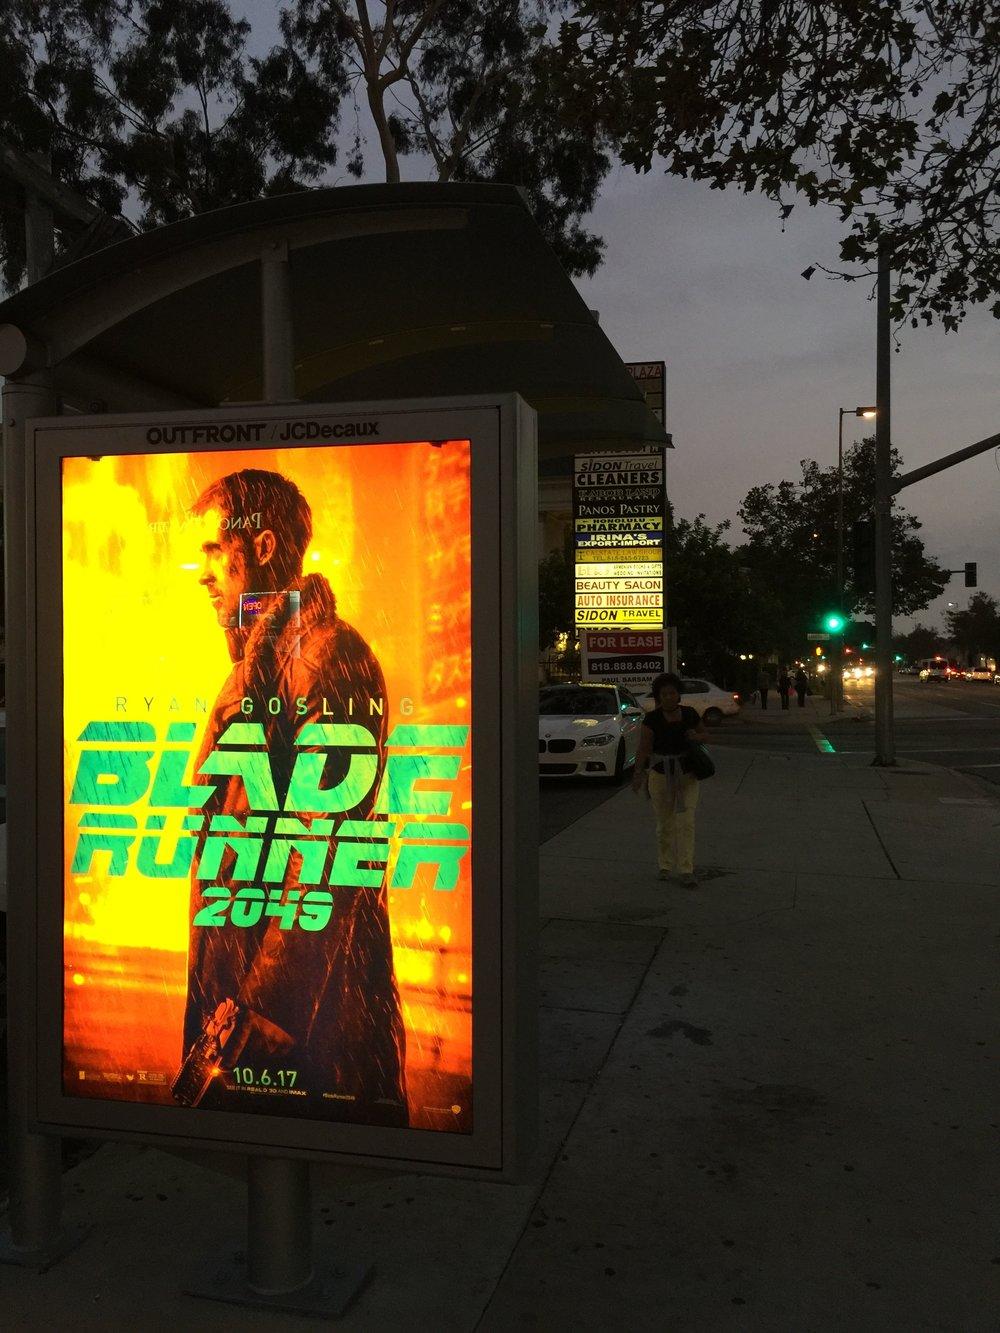 bladreunner 2049 bus stop.jpg